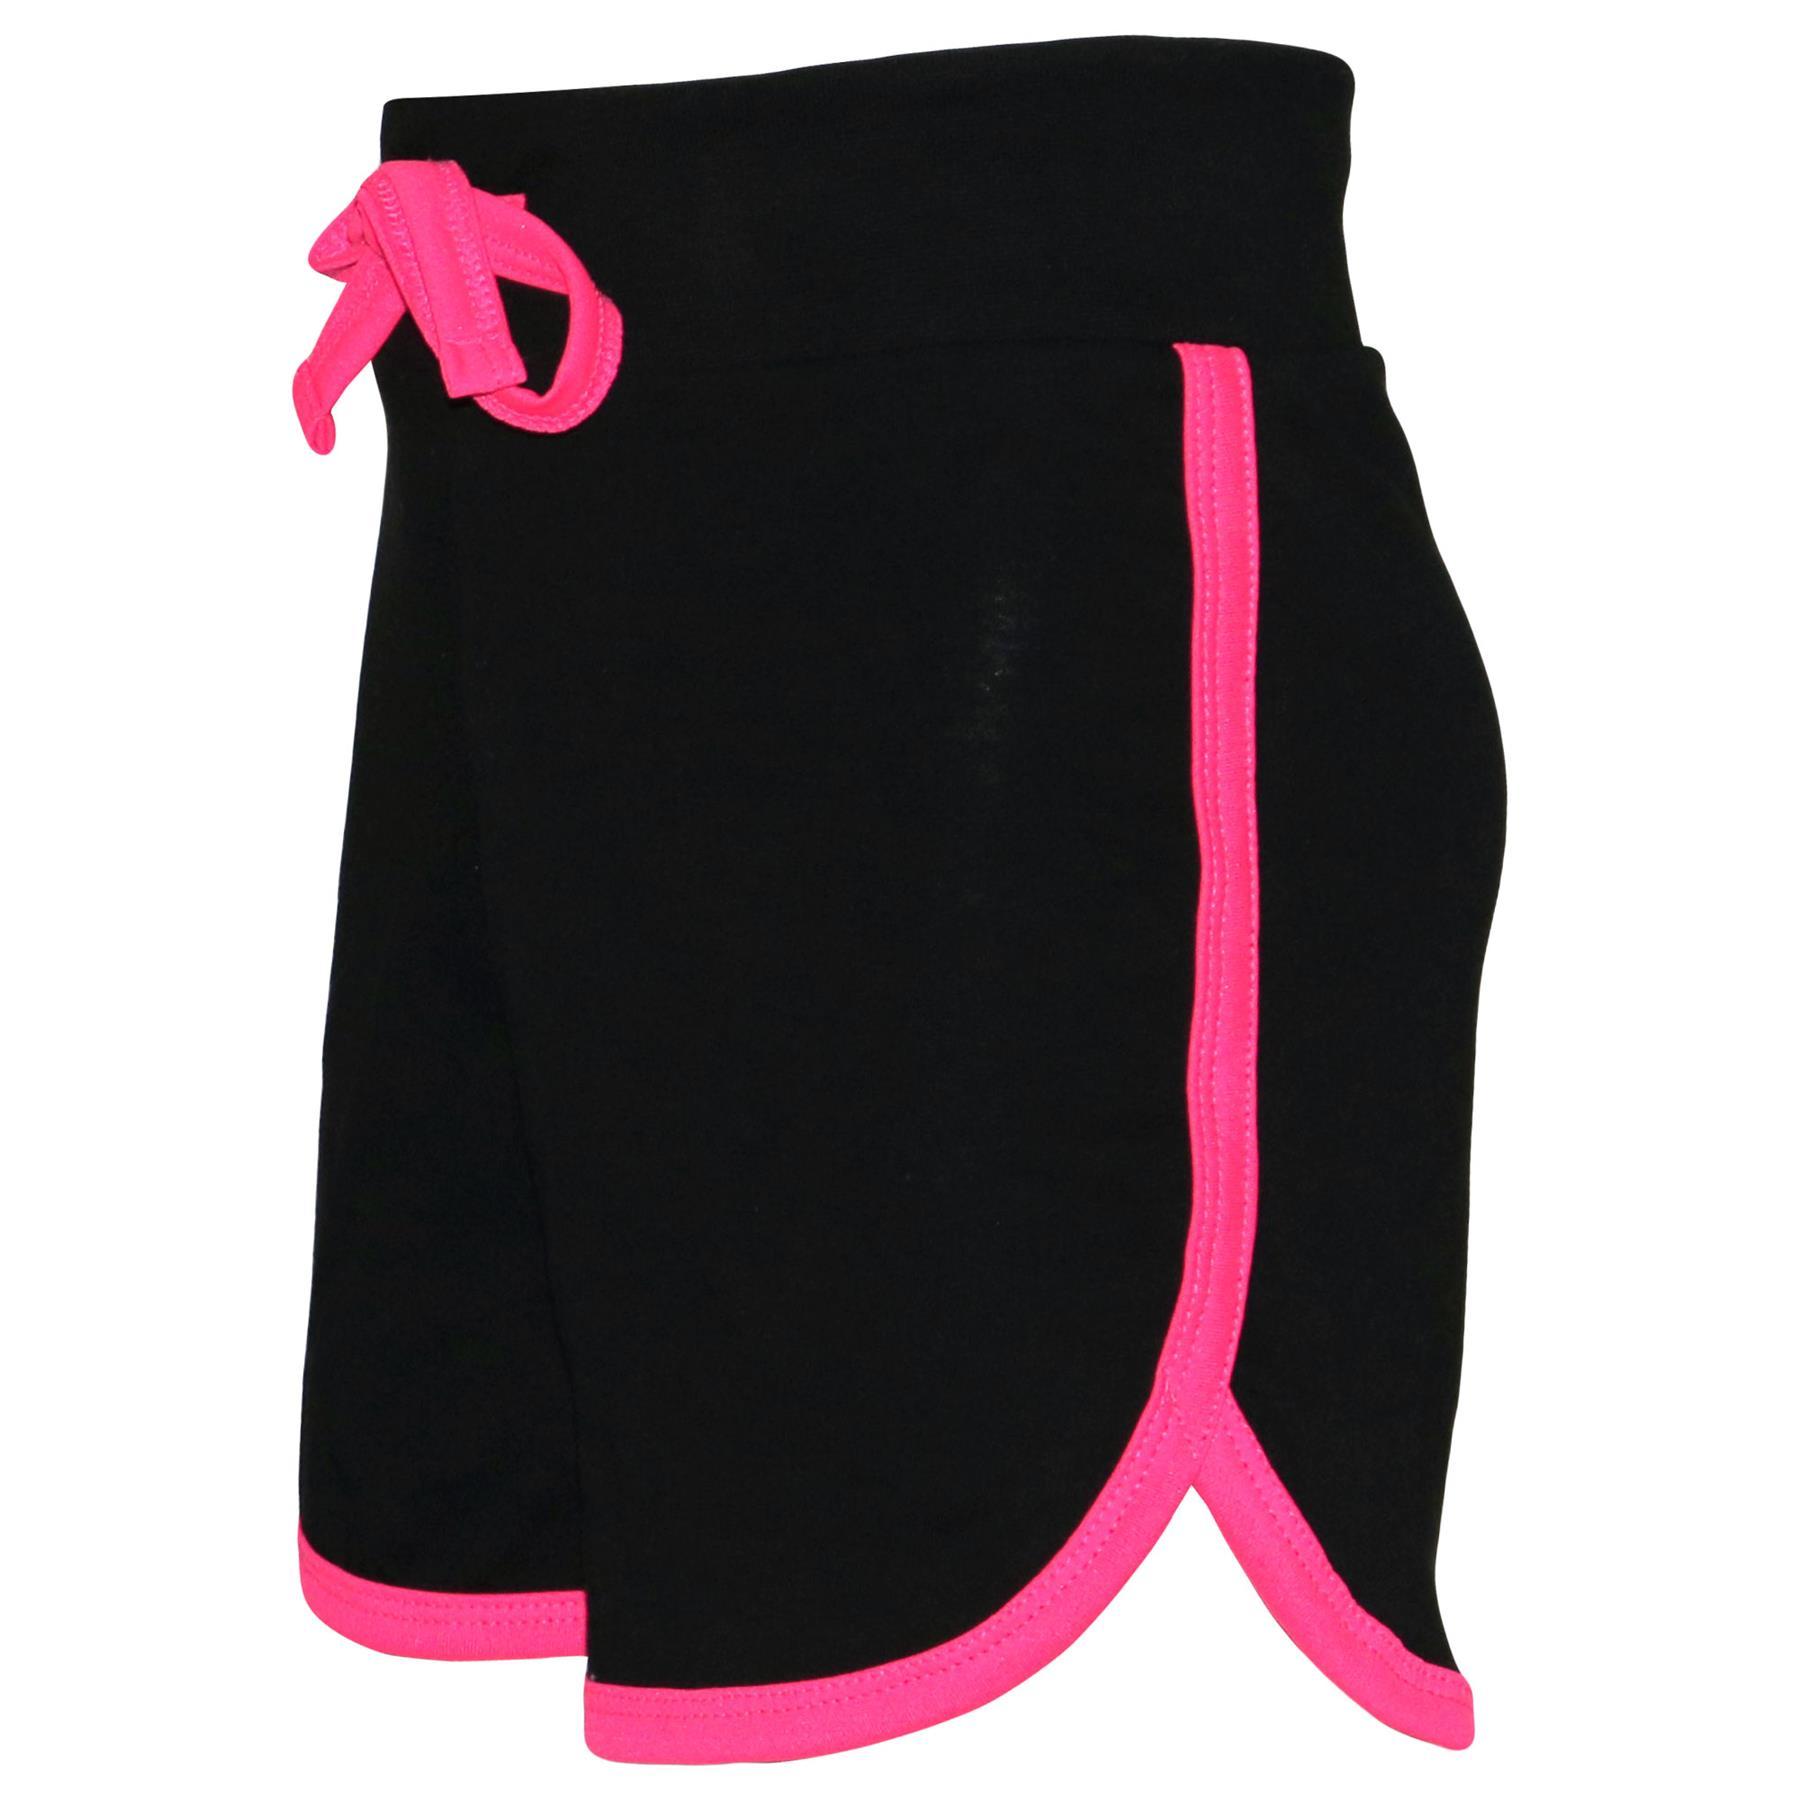 Kids-Girls-Shorts-100-Cotton-Dance-Gym-Sports-Summer-Hot-Short-Pants-2-13-Years Indexbild 13